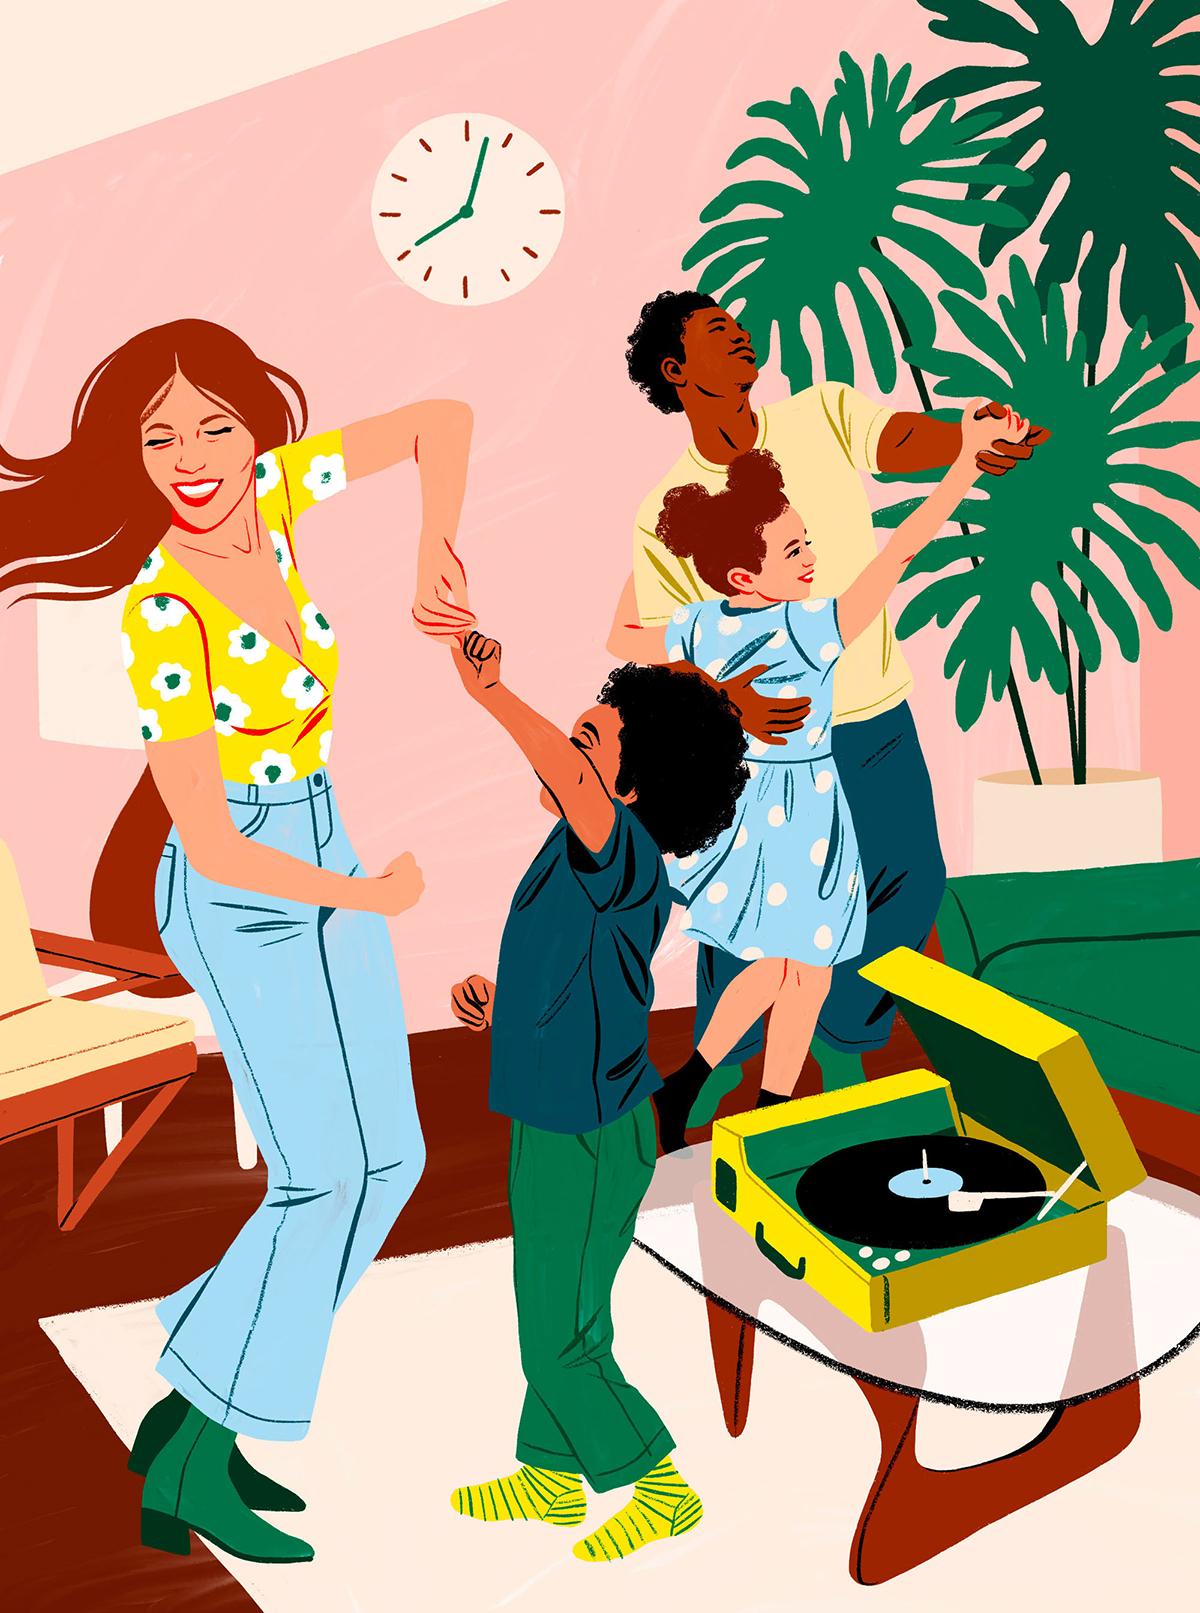 Babysitting clipart blended family. A united tips for